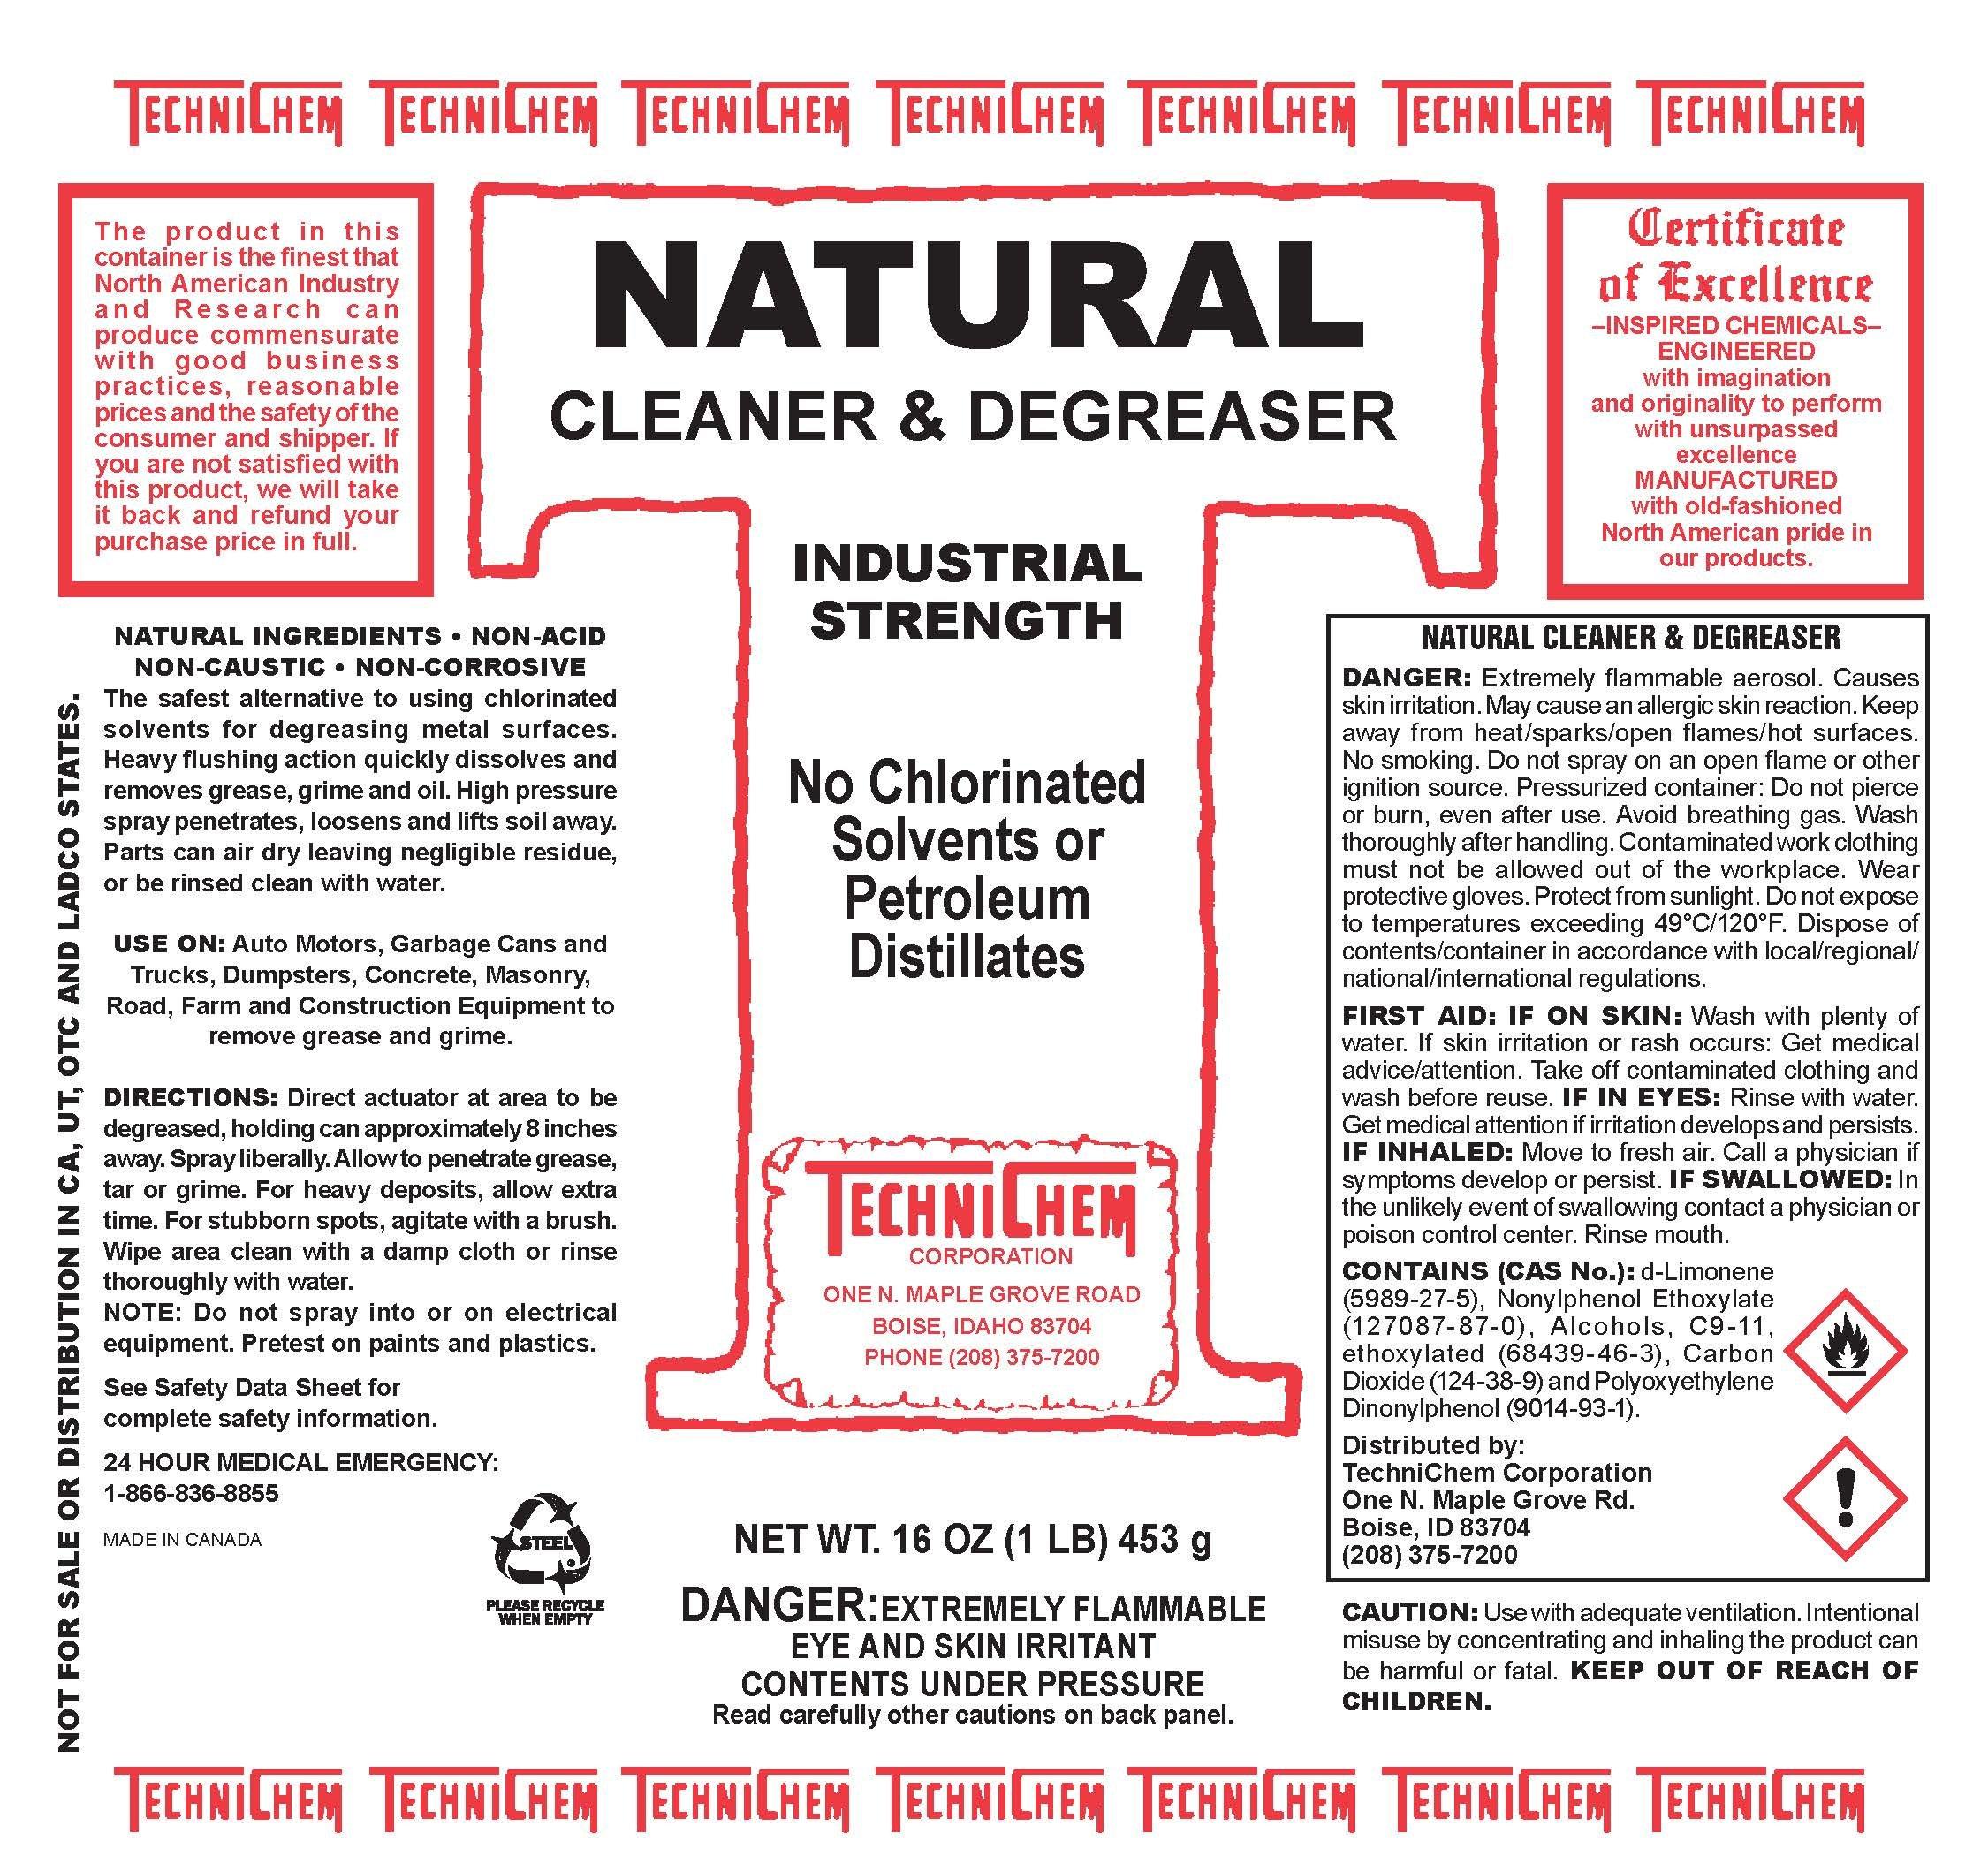 Technichem Corporation NATURAL Citrus Aerosol Cleaner (12-16oz cans) by Technichem Corporation (Image #2)